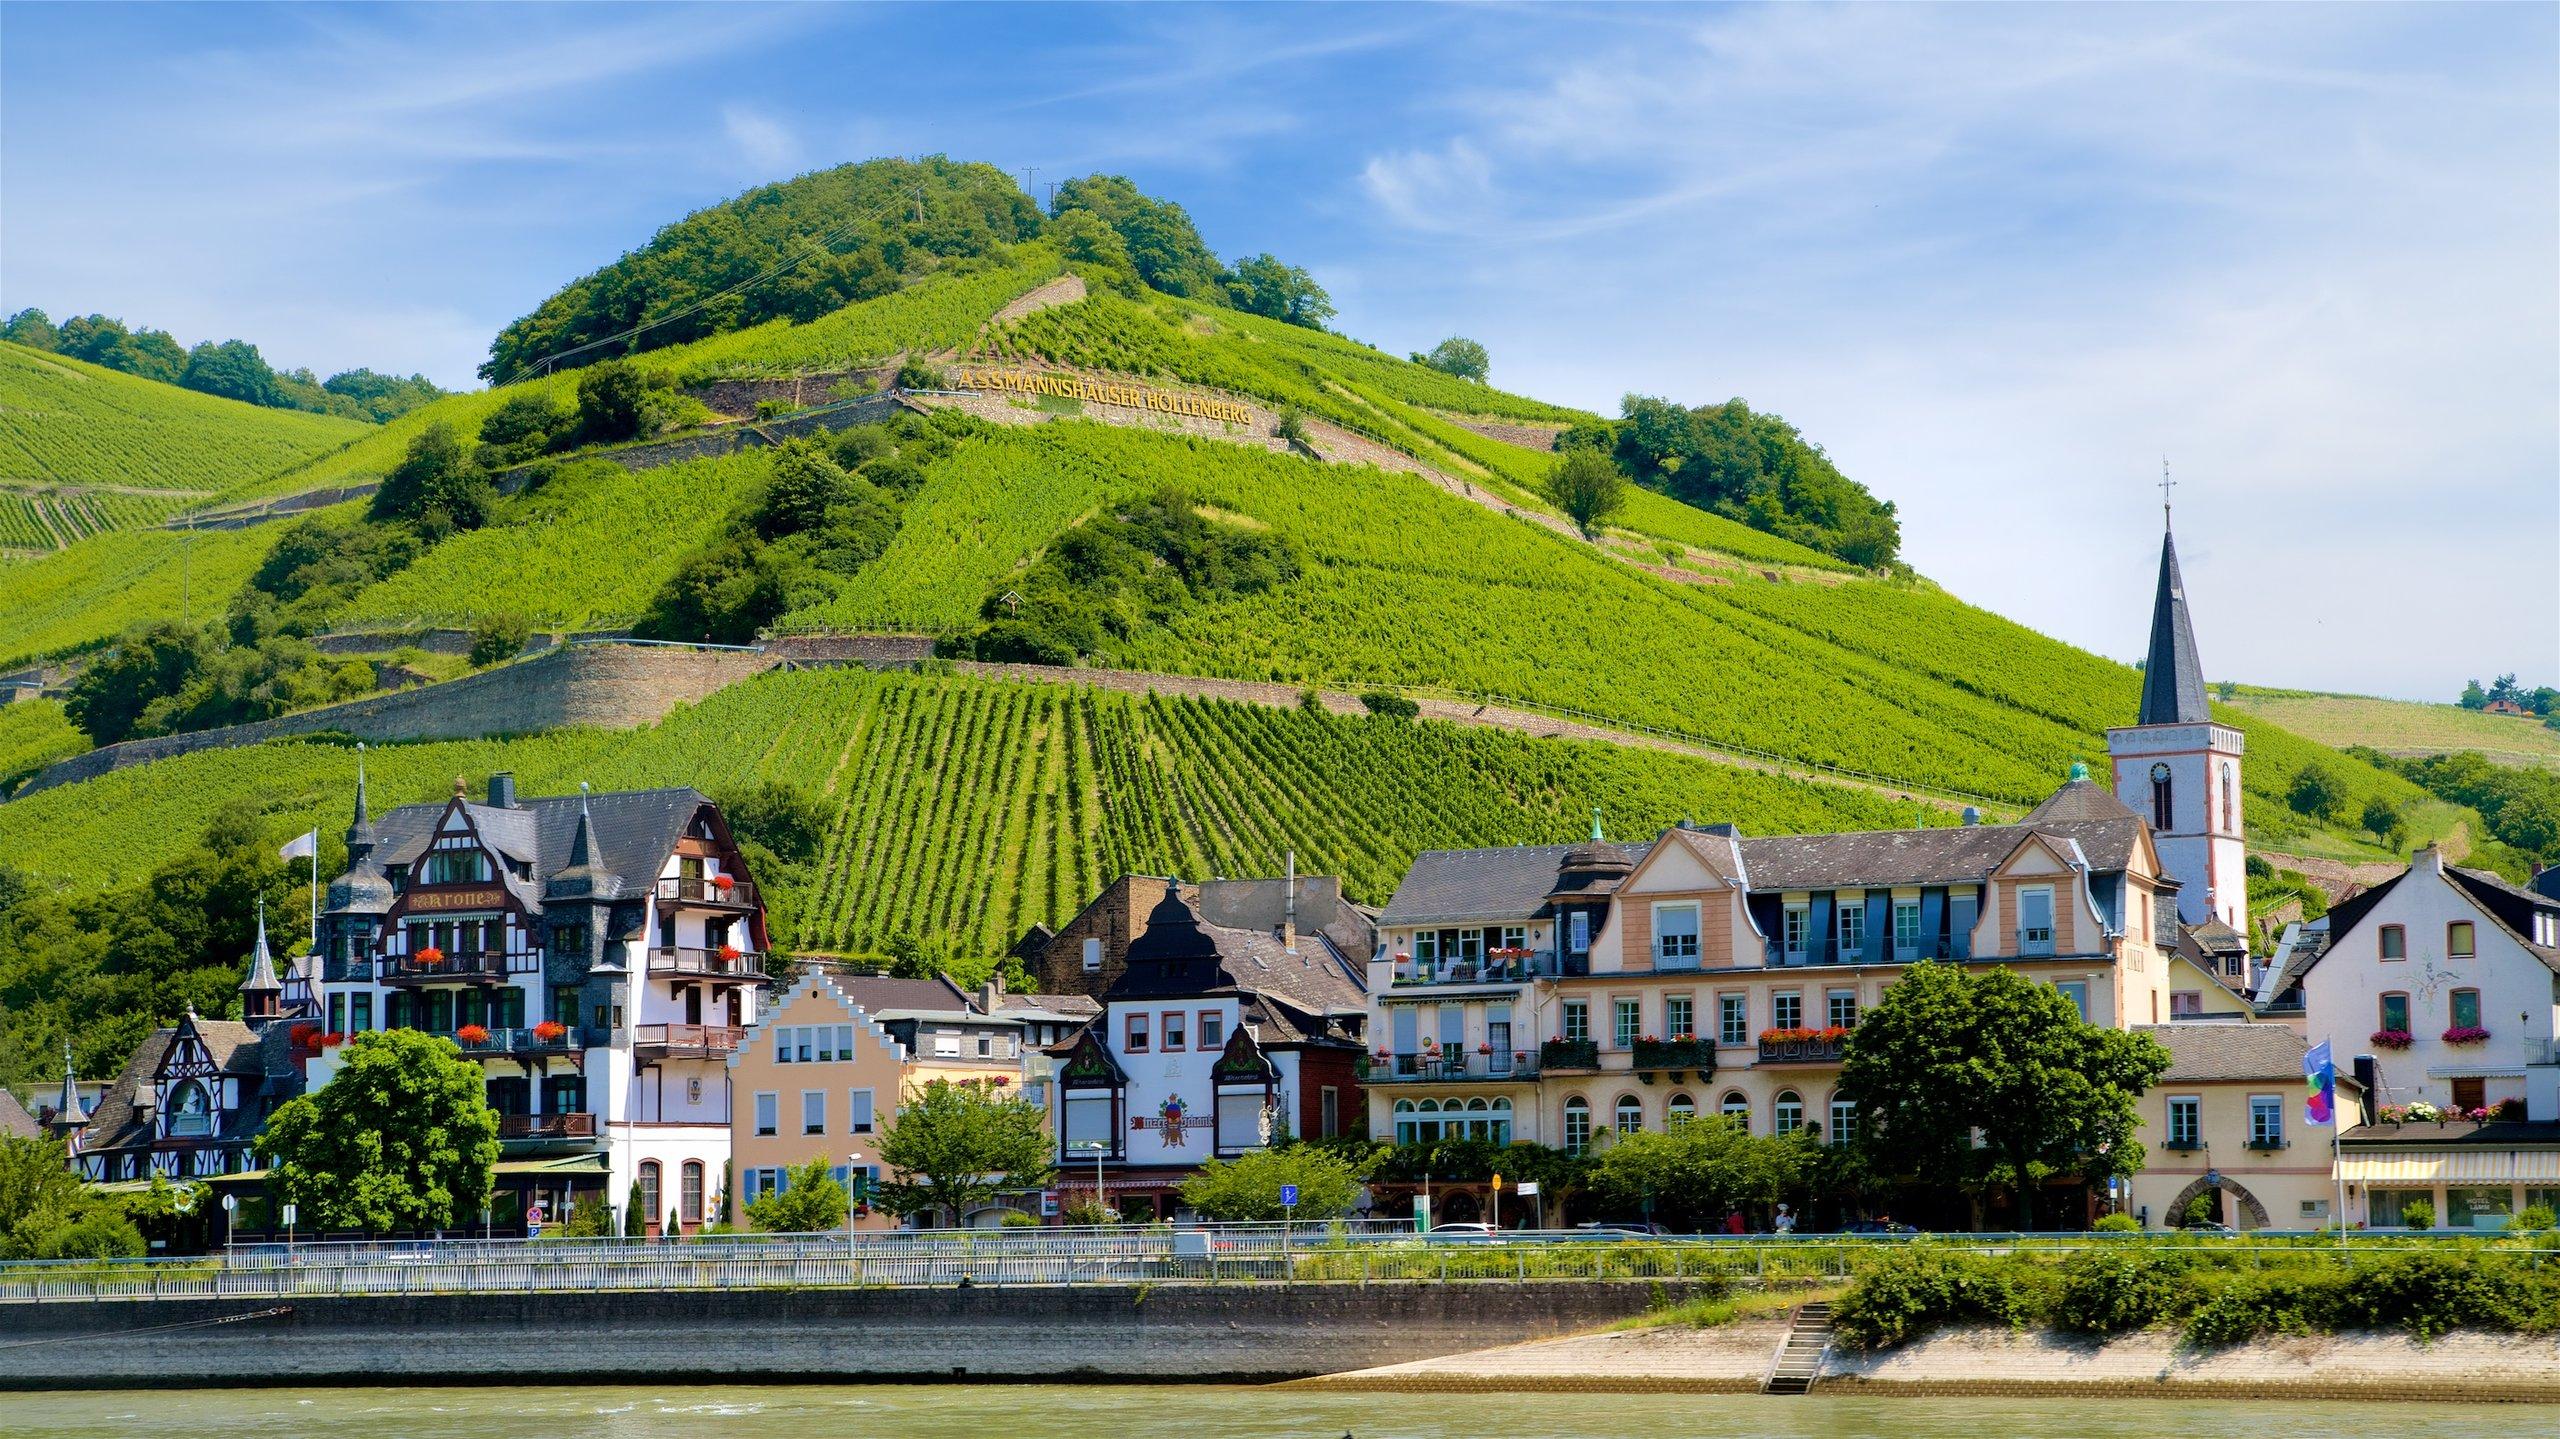 Bingen am Rhein, Rhineland-Palatinate, Germany